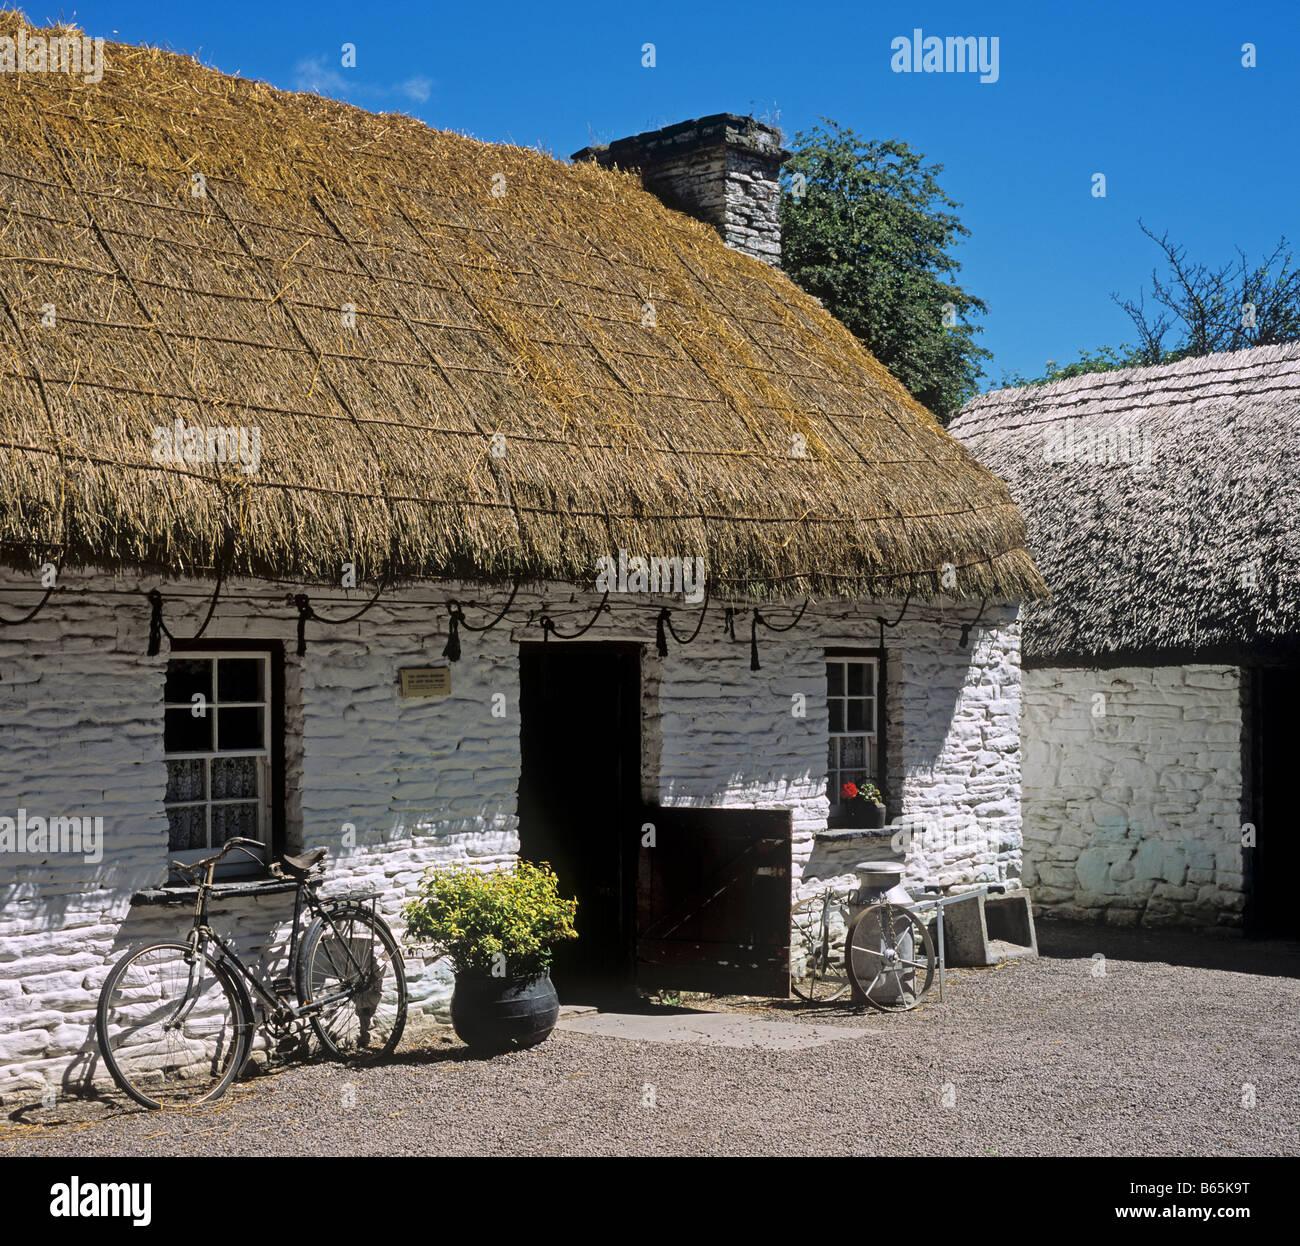 1381 Bunratty Castle Folk Park Co Clare Republic of Ireland - Stock Image